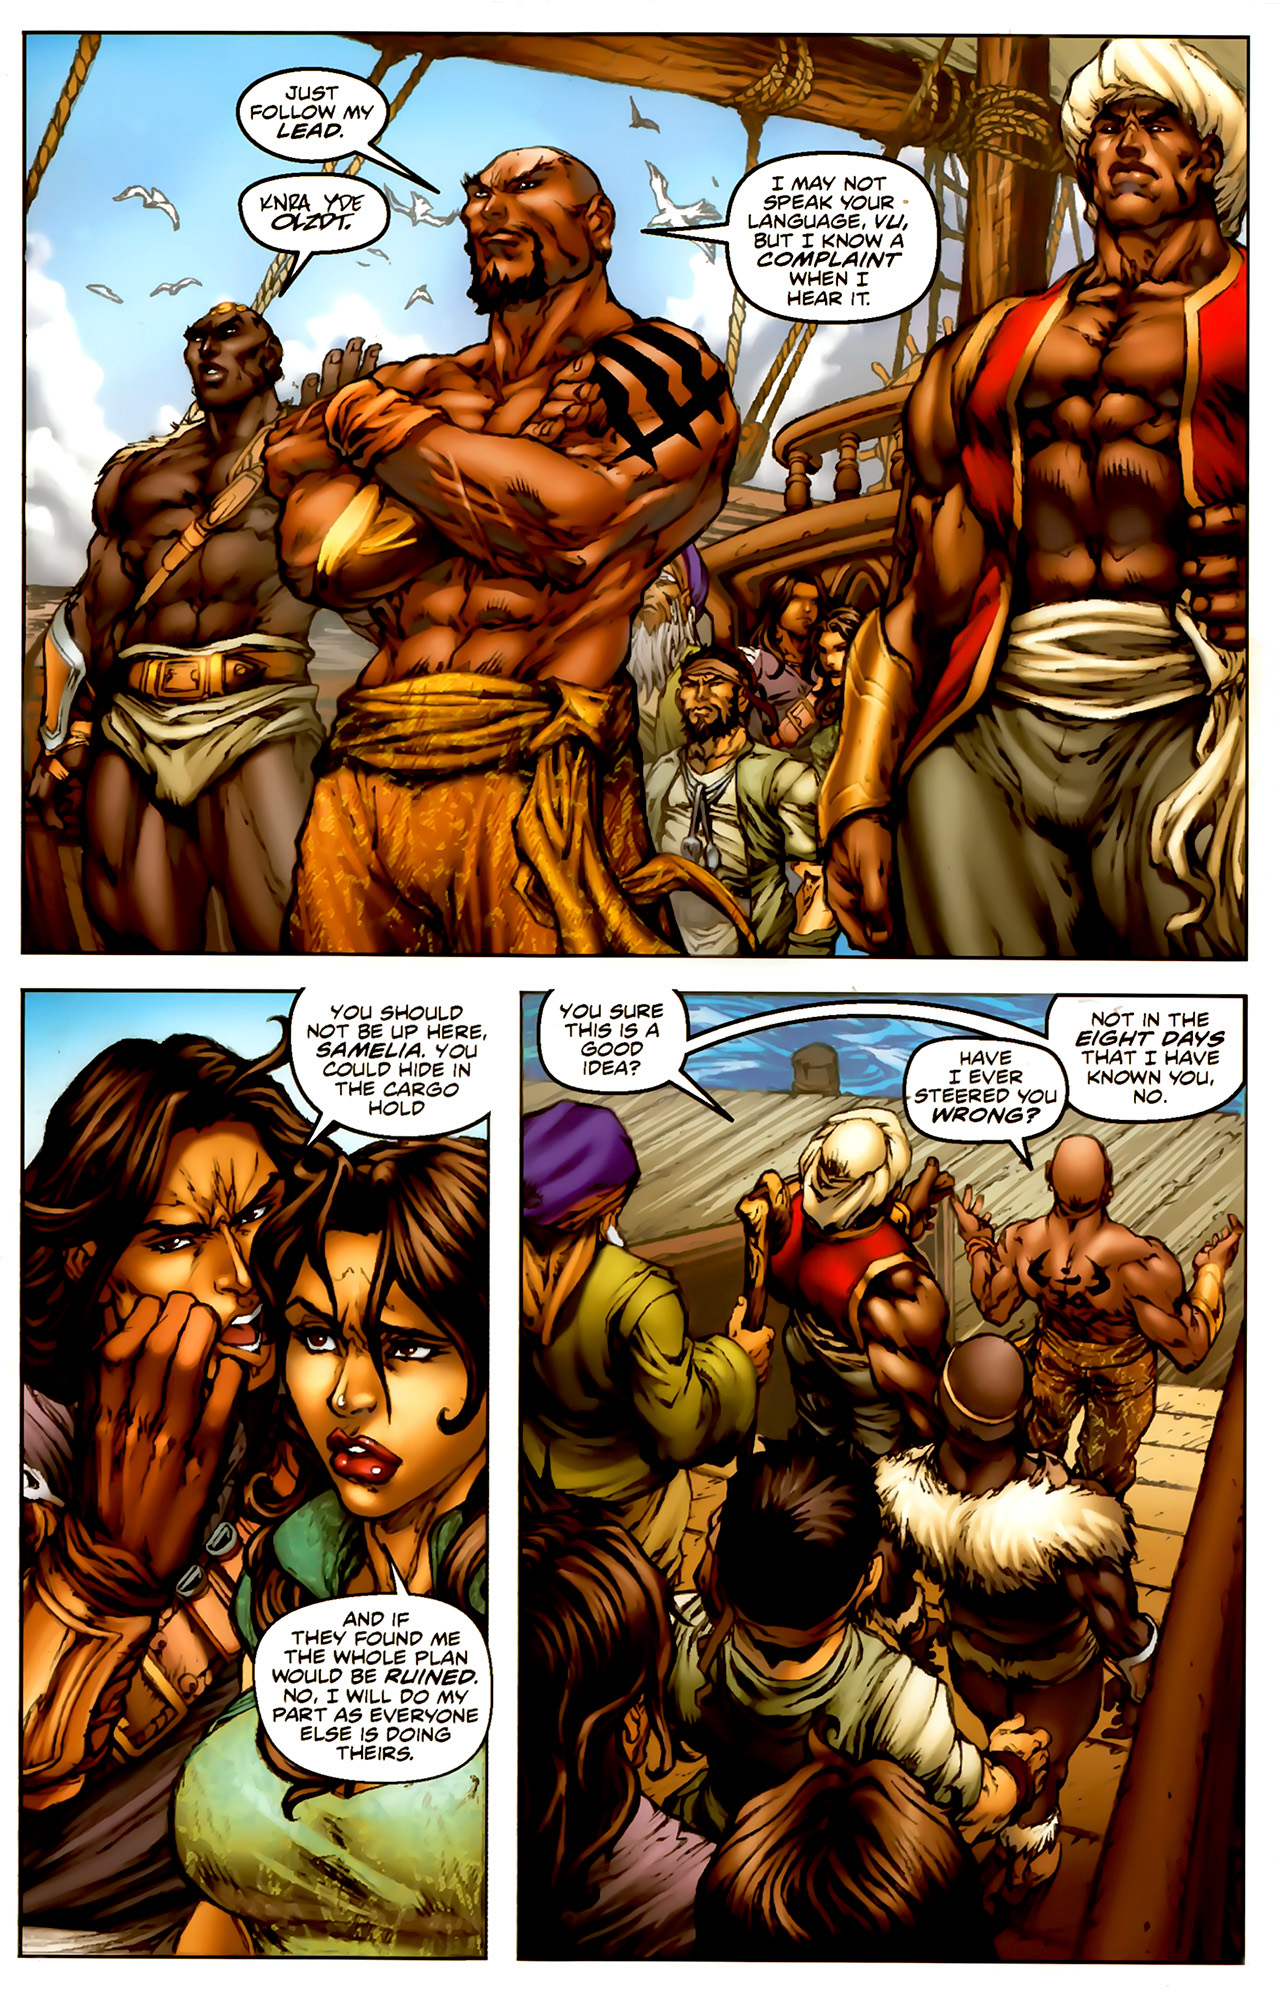 Read online 1001 Arabian Nights: The Adventures of Sinbad comic -  Issue #1 - 10